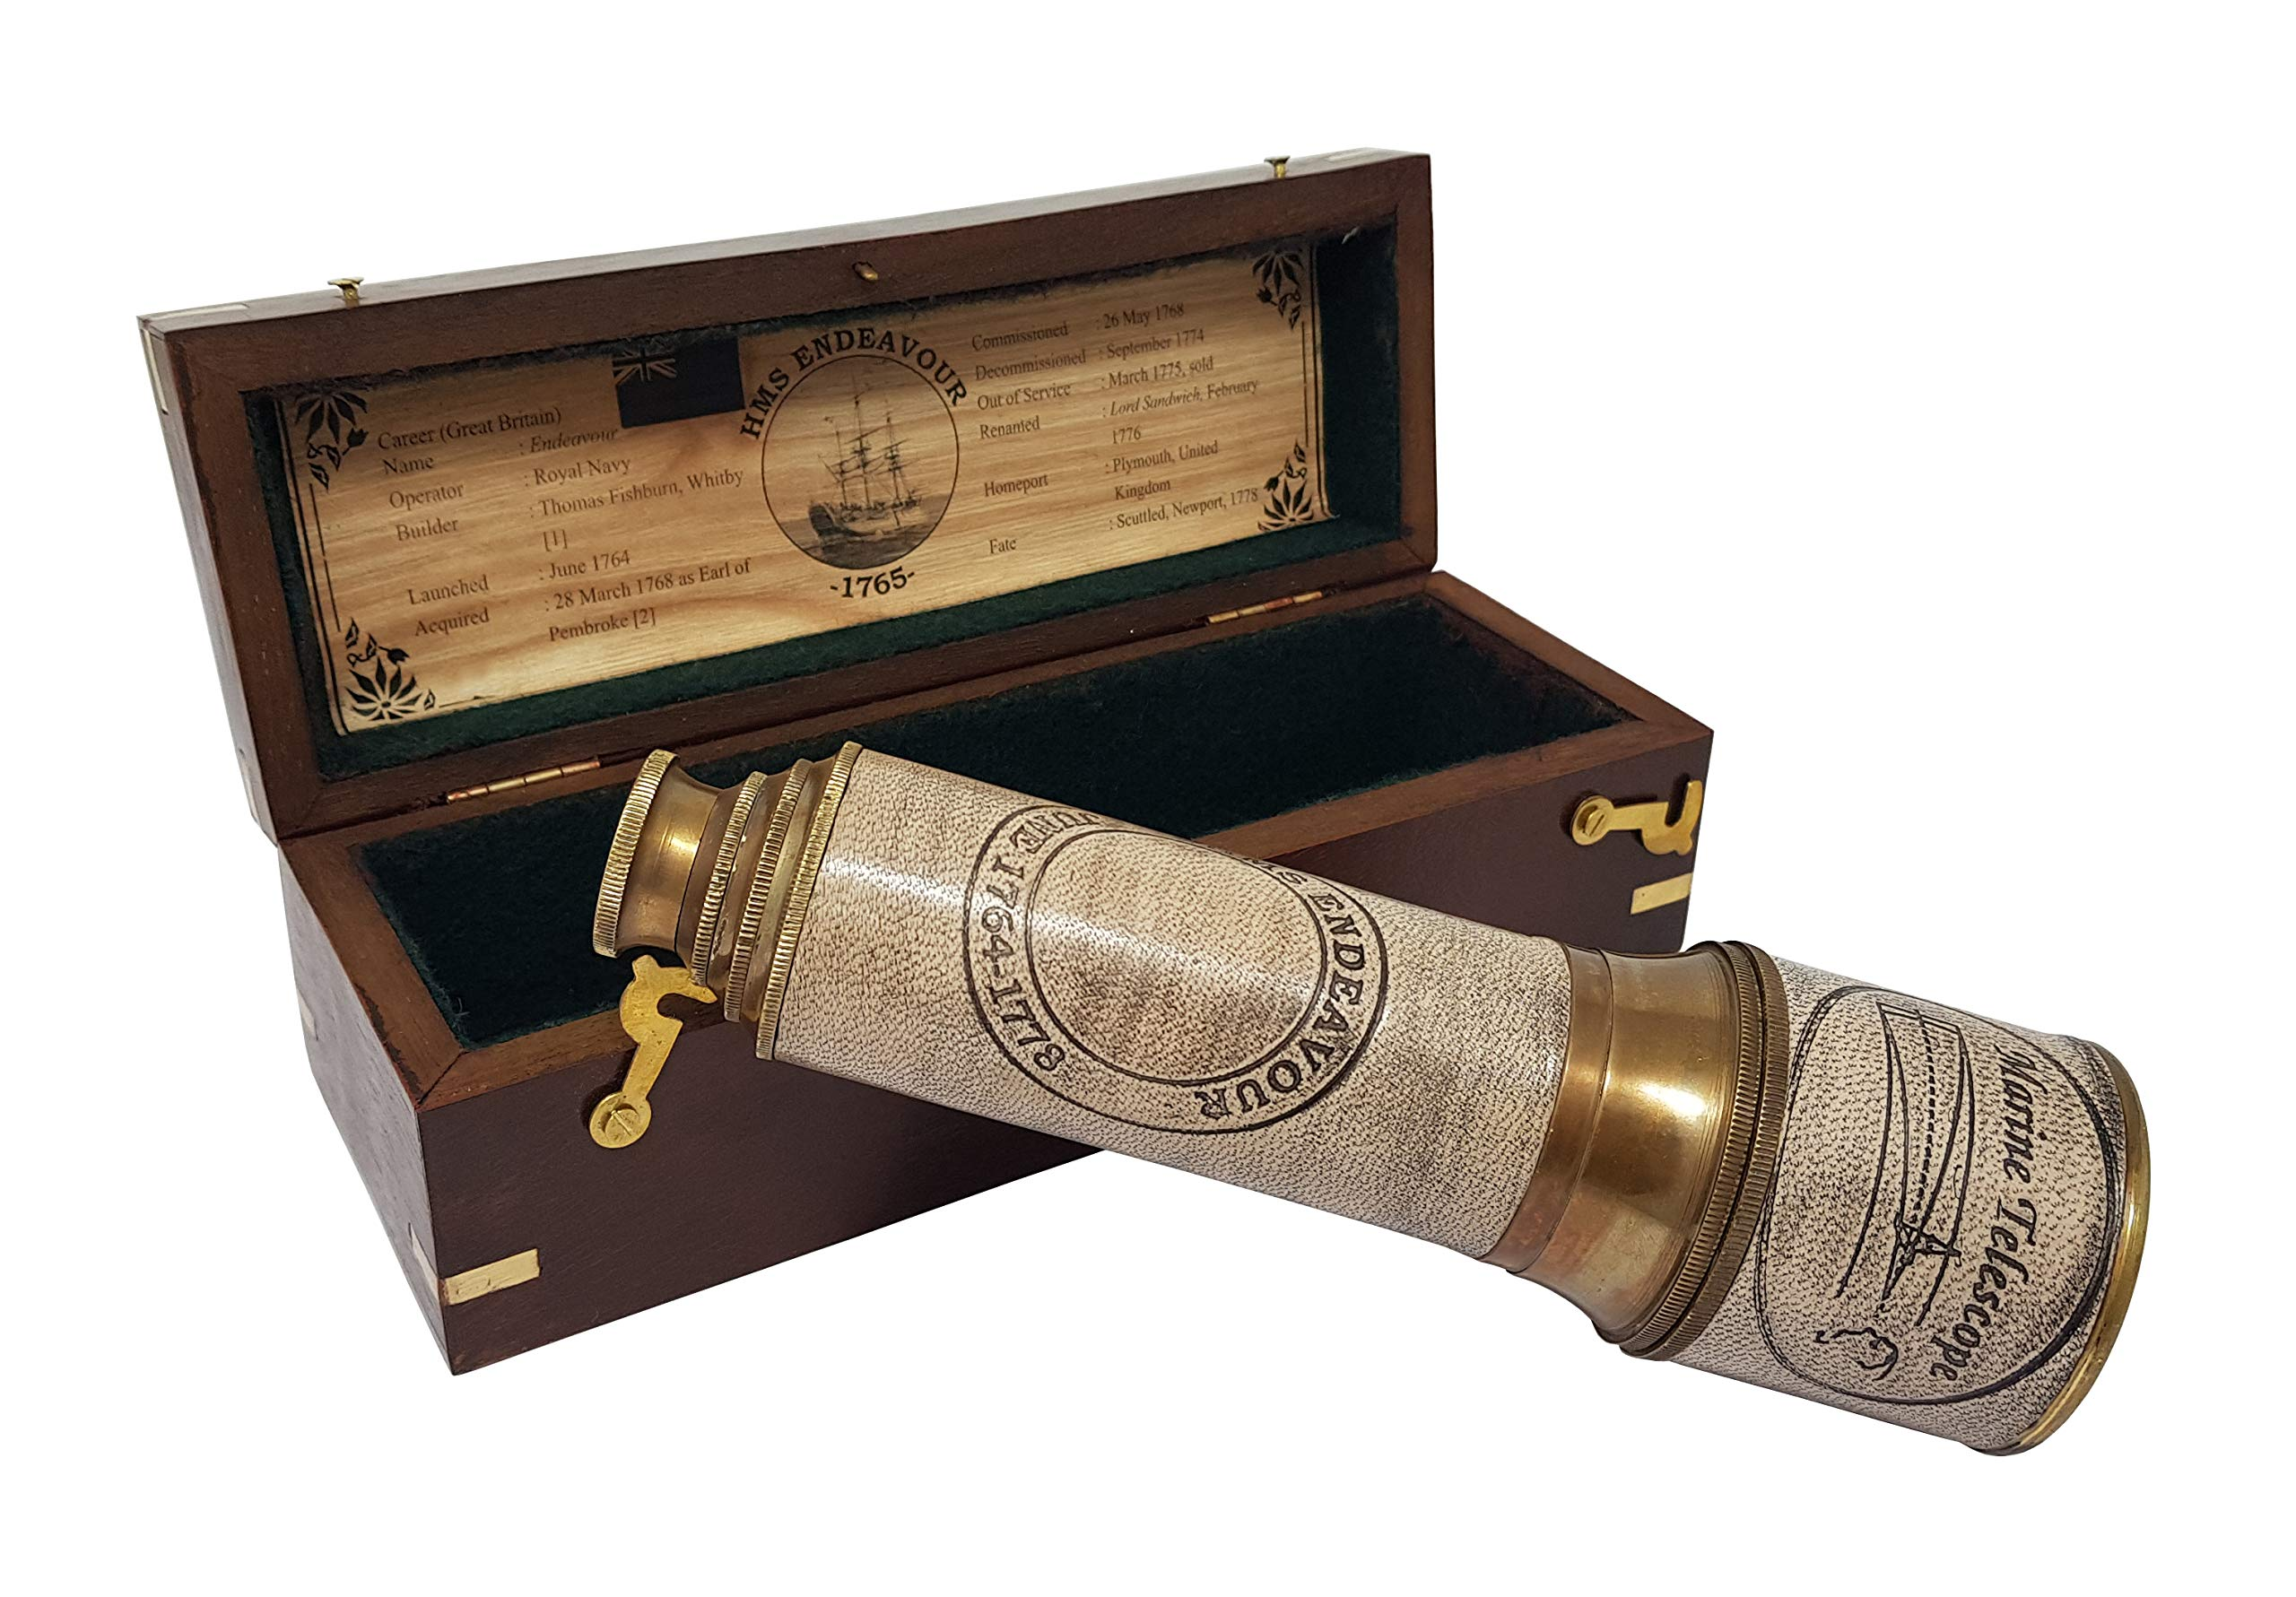 Brass Nautical - 18 inches Brass Ship Captain's Telescope Brass Spyglass in Hardwood Box by Brass Nautical